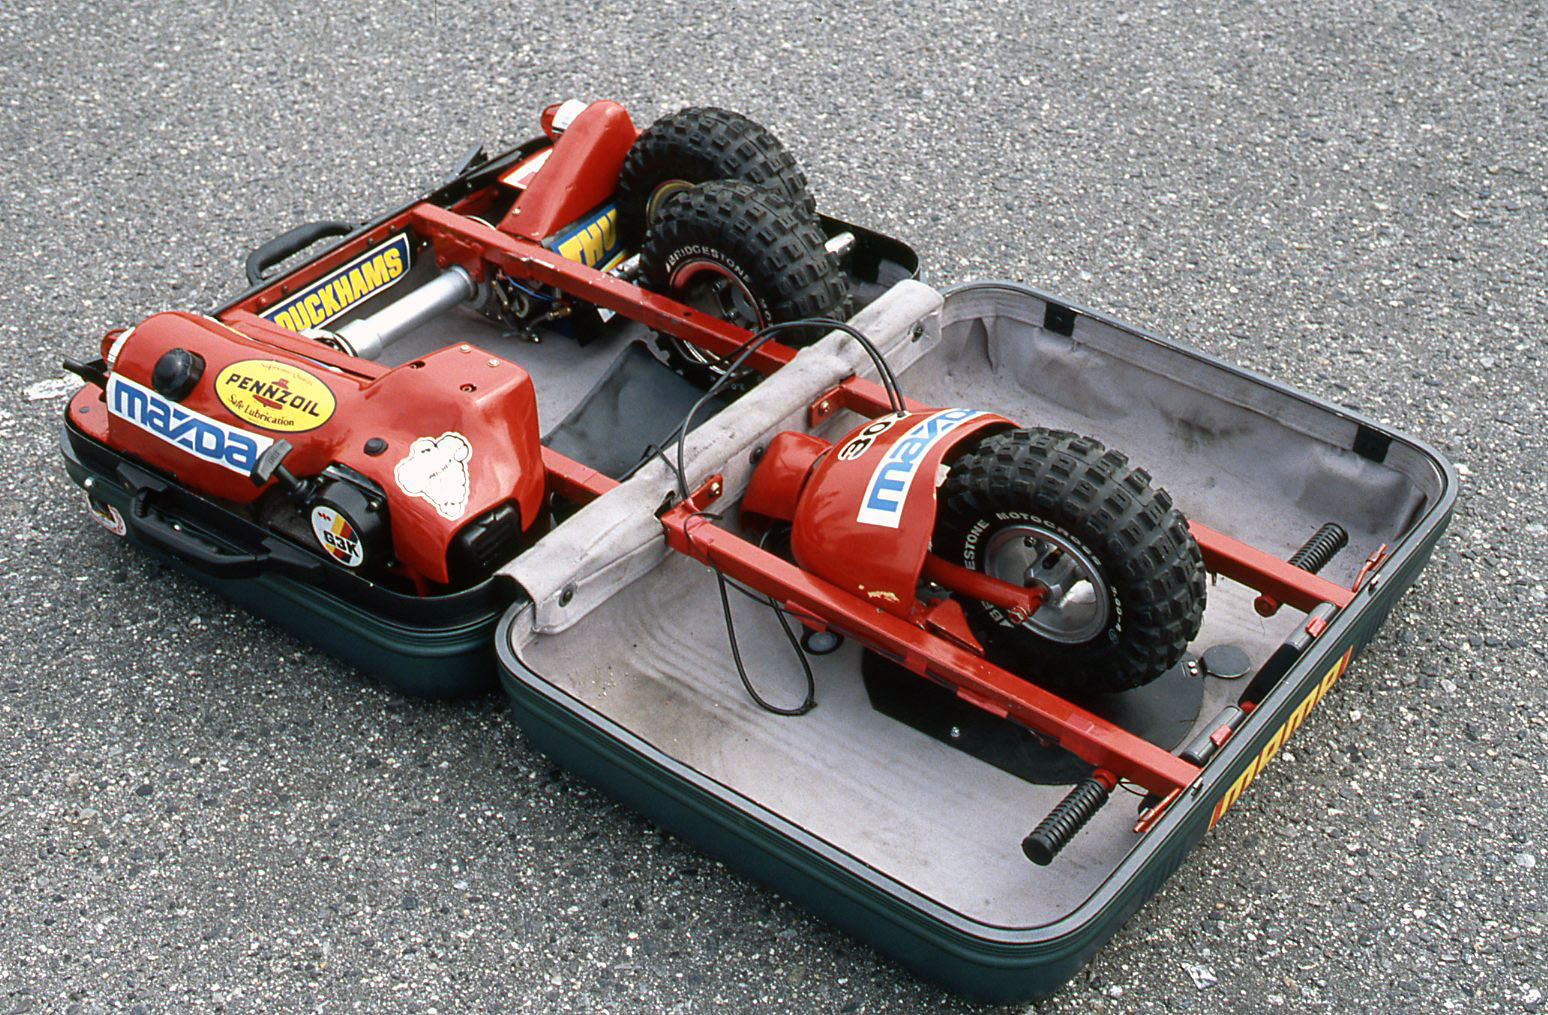 [Obrázek: Mazda_Suitcase_Car-4.jpg]